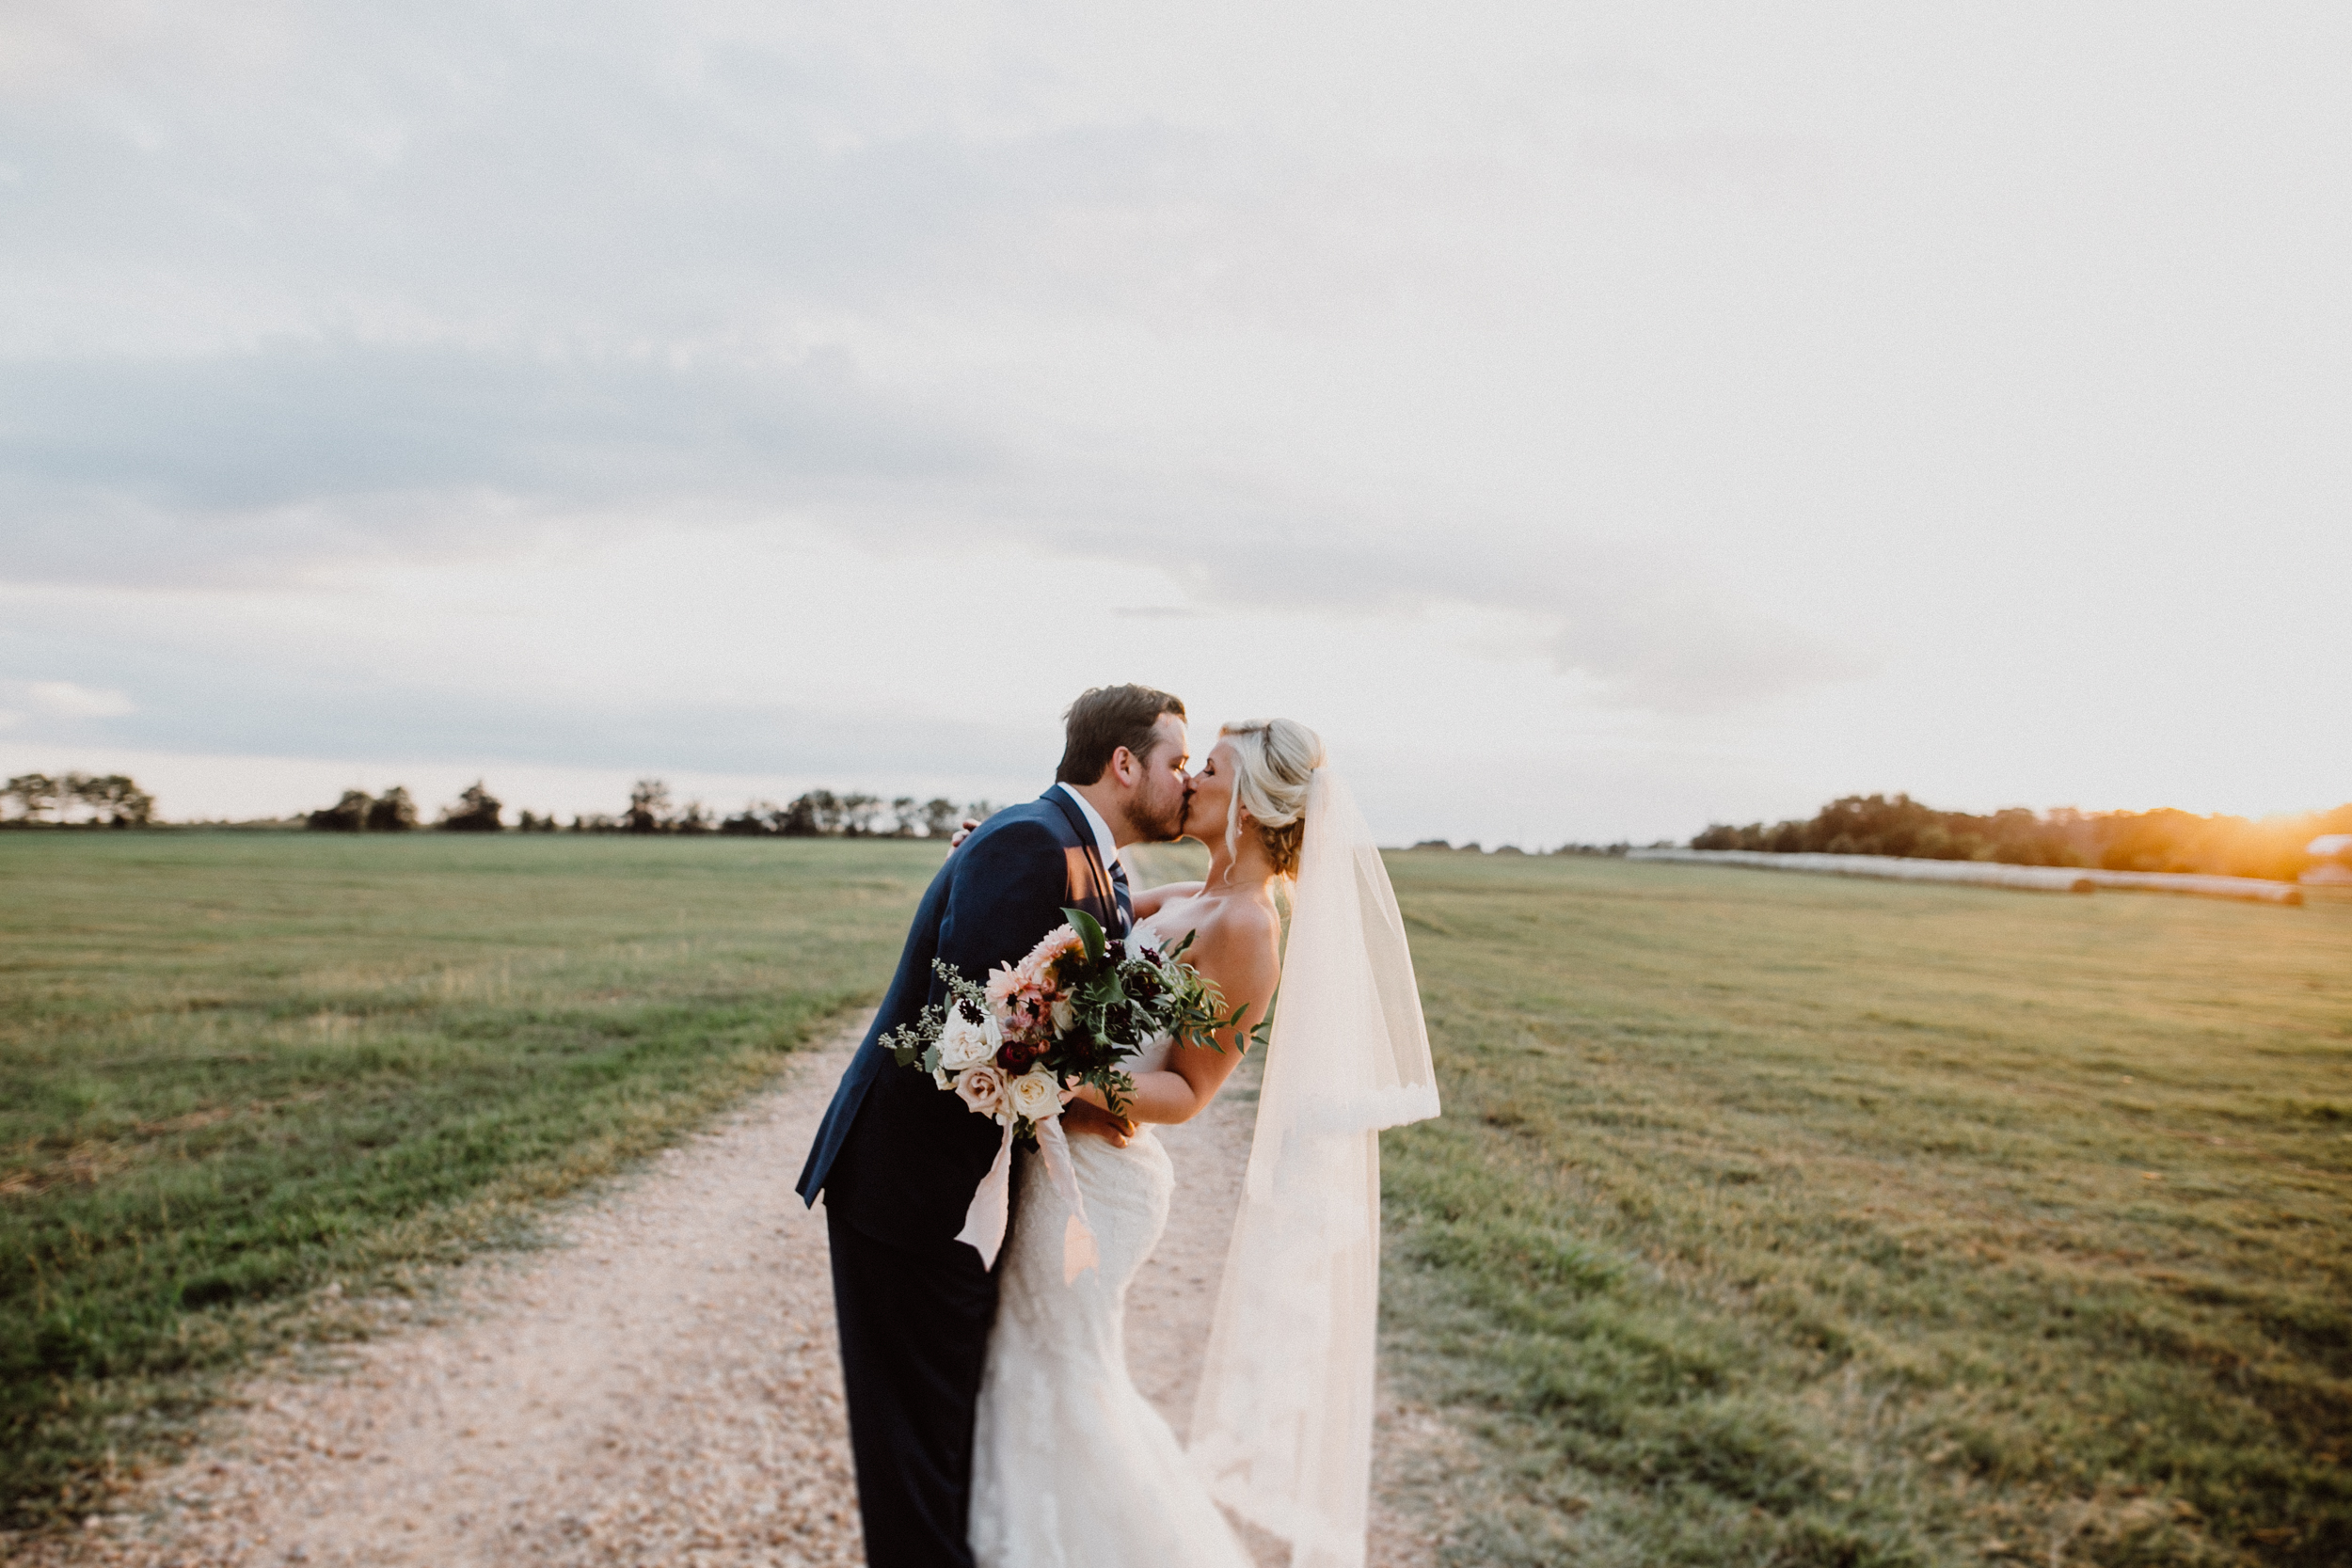 the-prairie-wedding-J&H-667.jpg